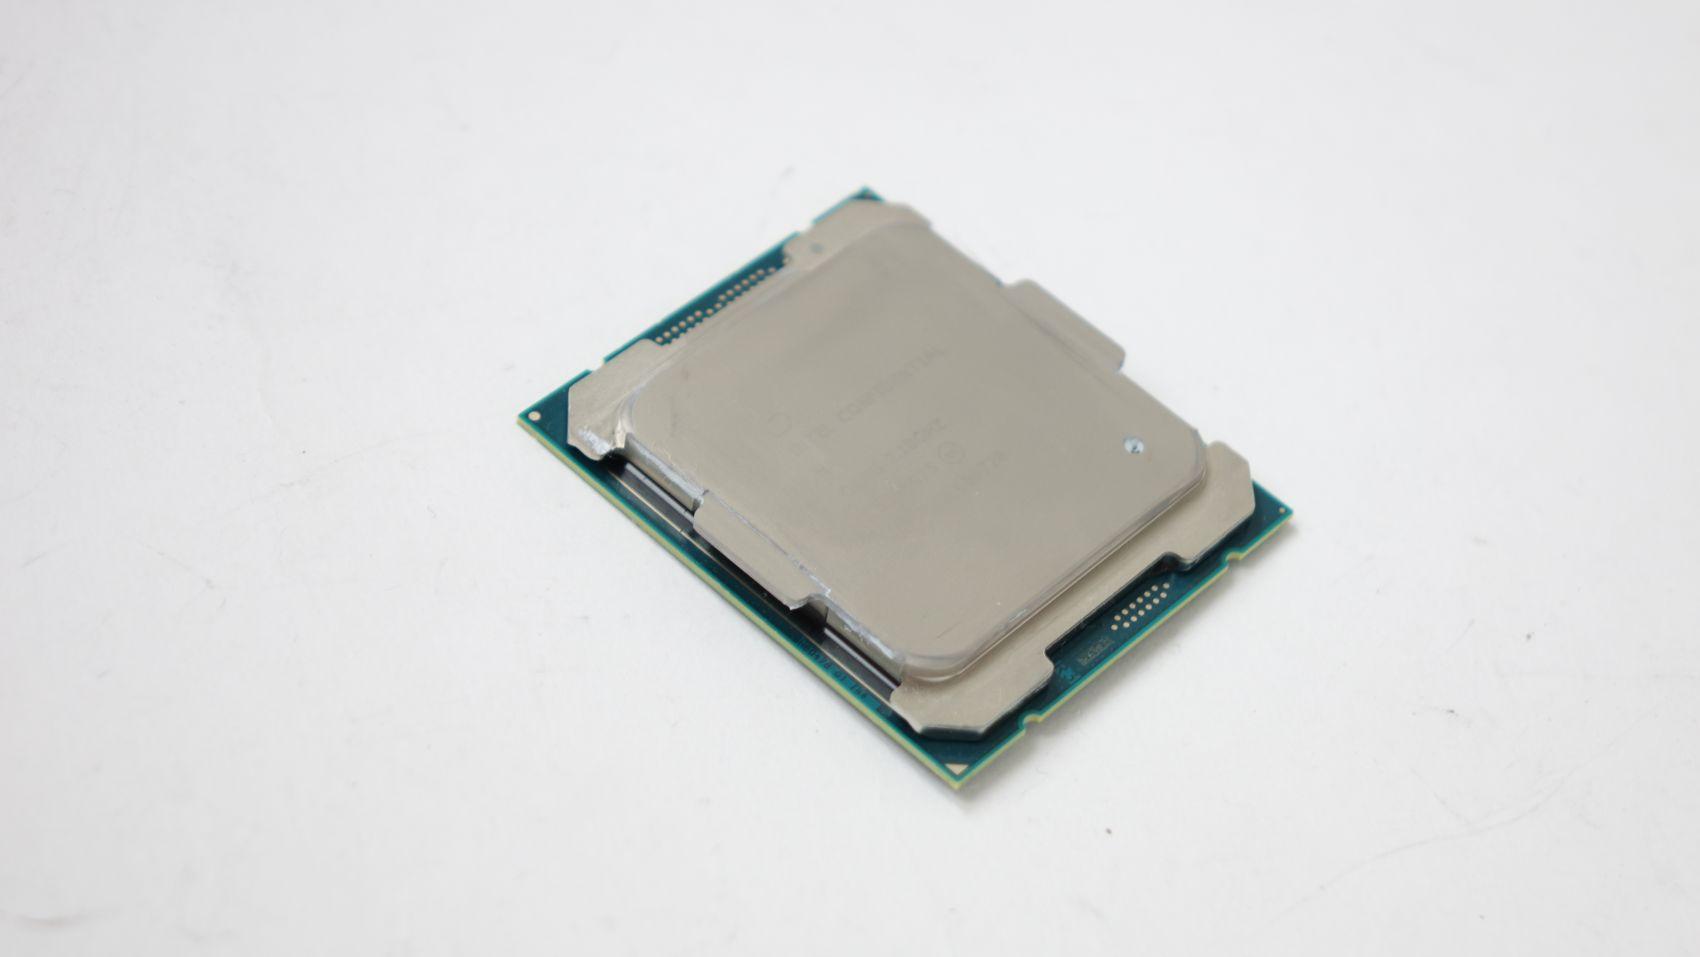 Intel Xeon E5-2620 v4